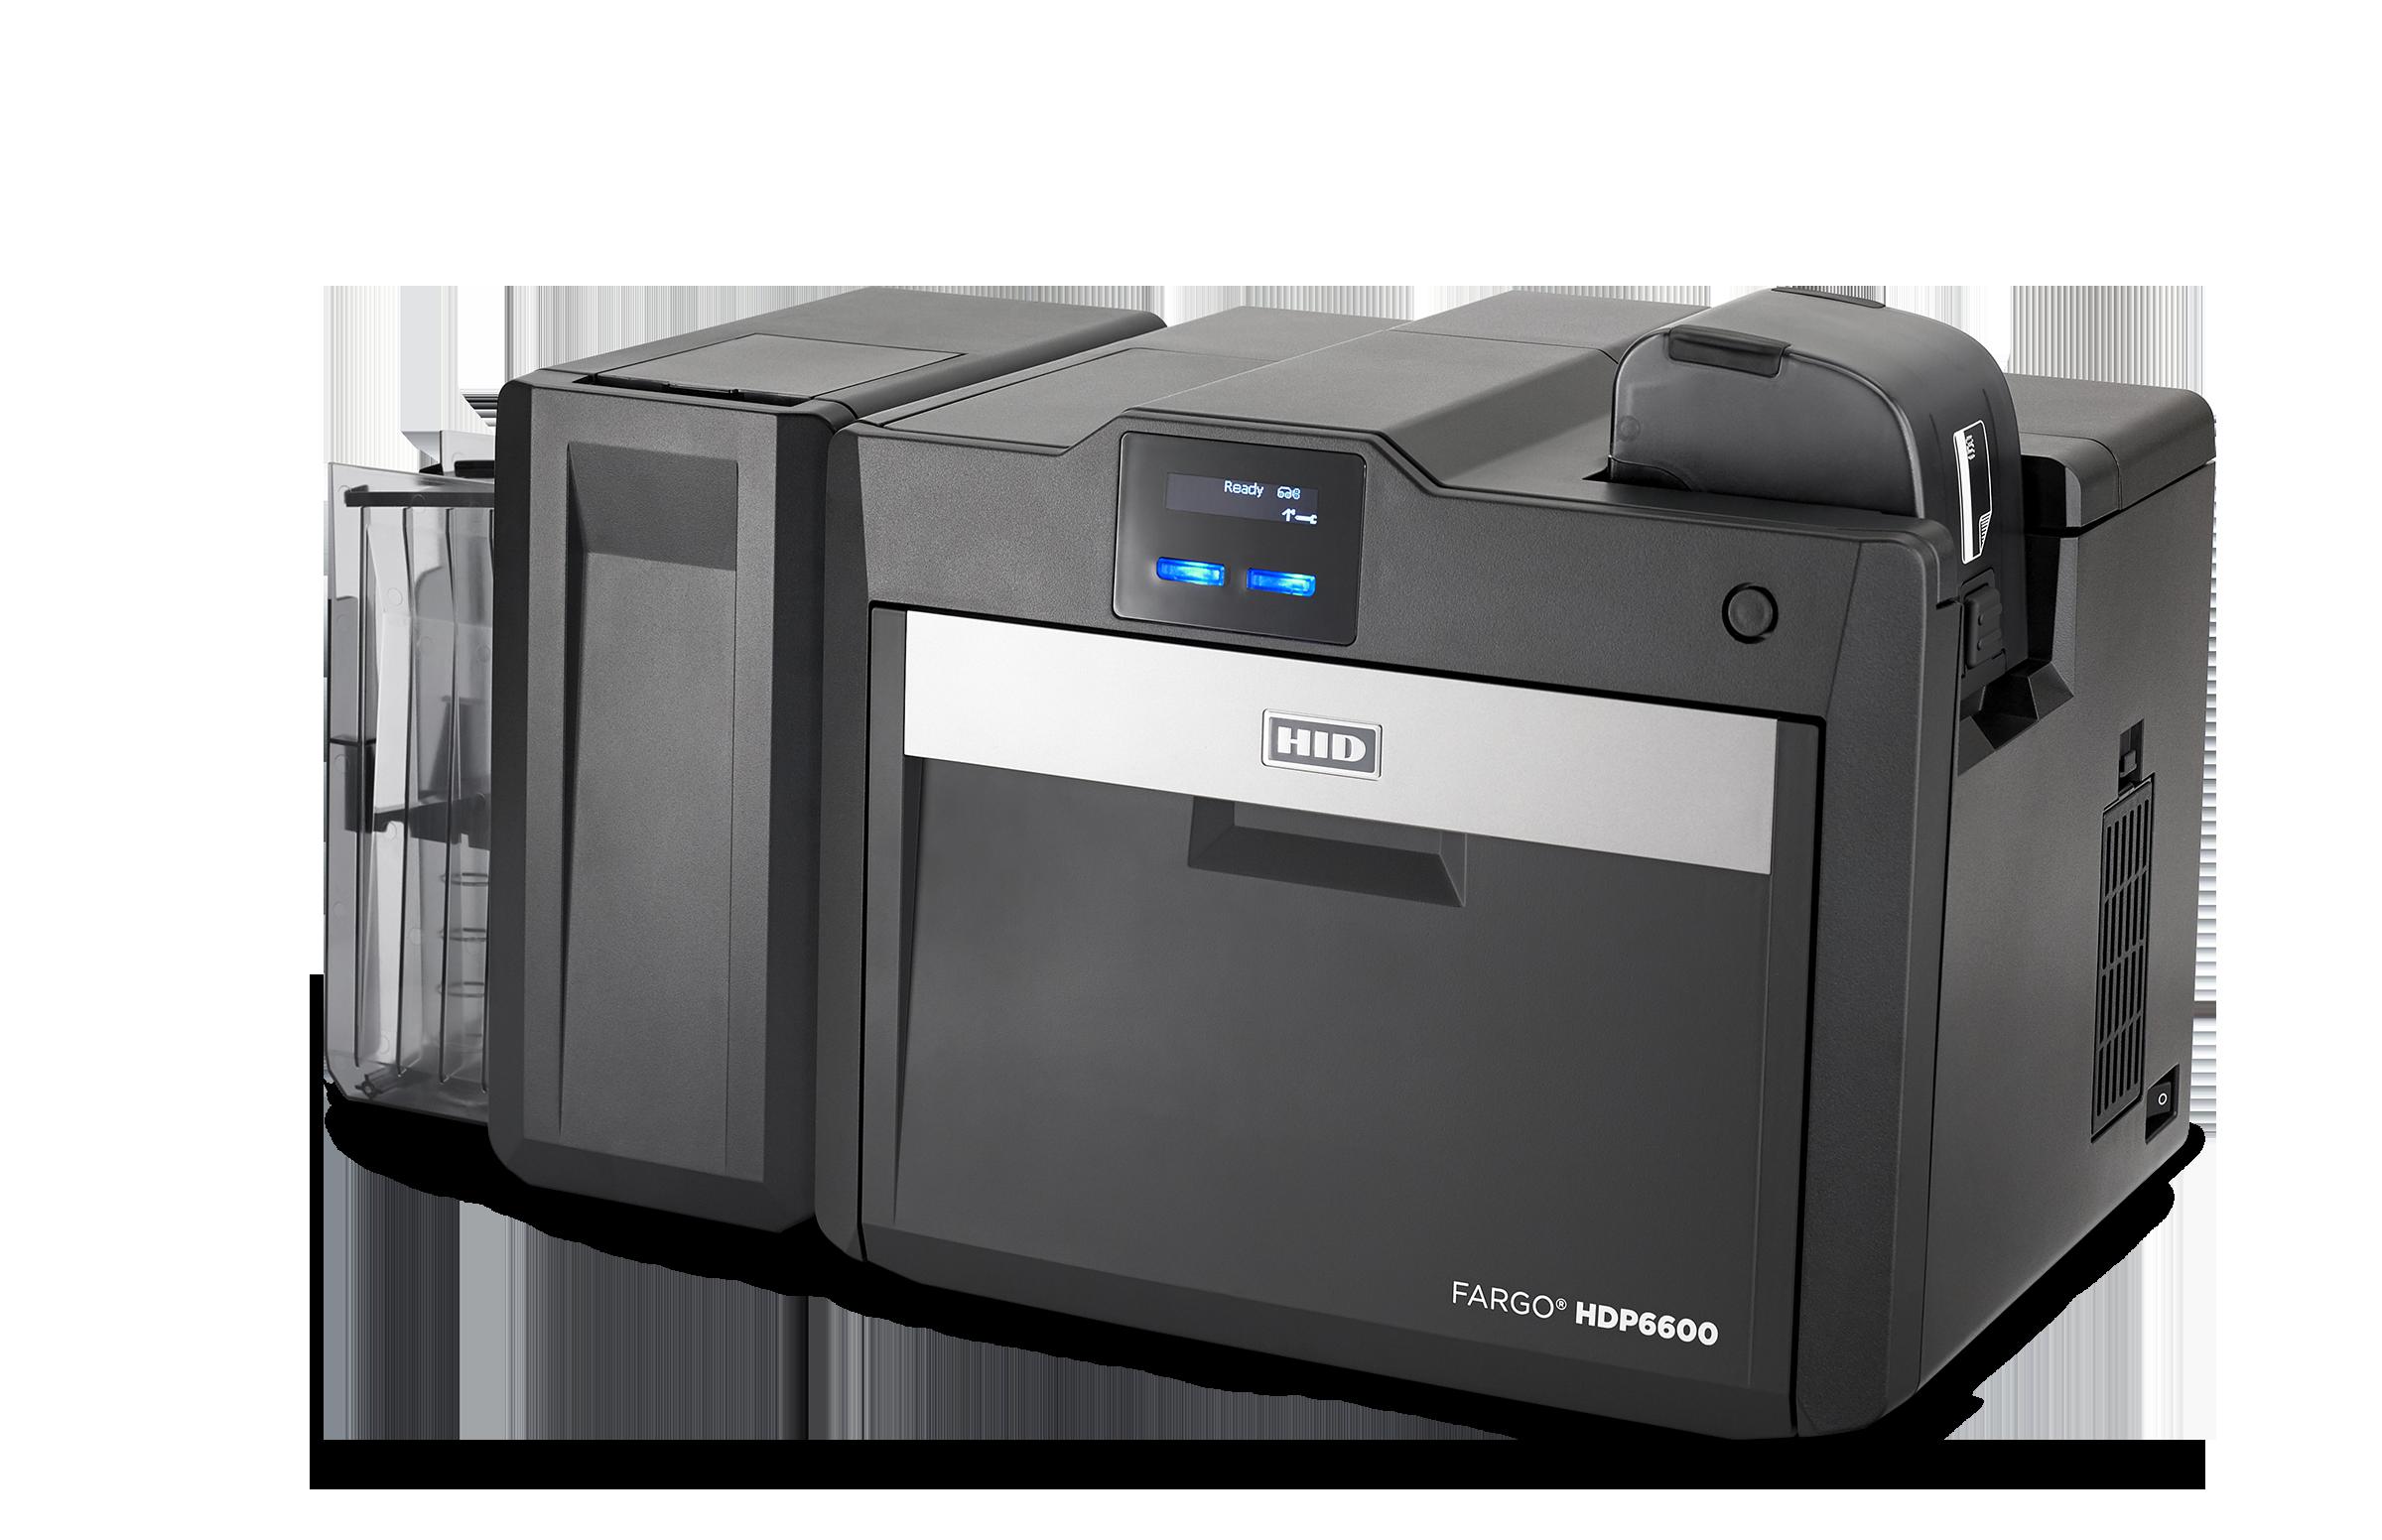 Fargo HDP6600 ID Card Printer